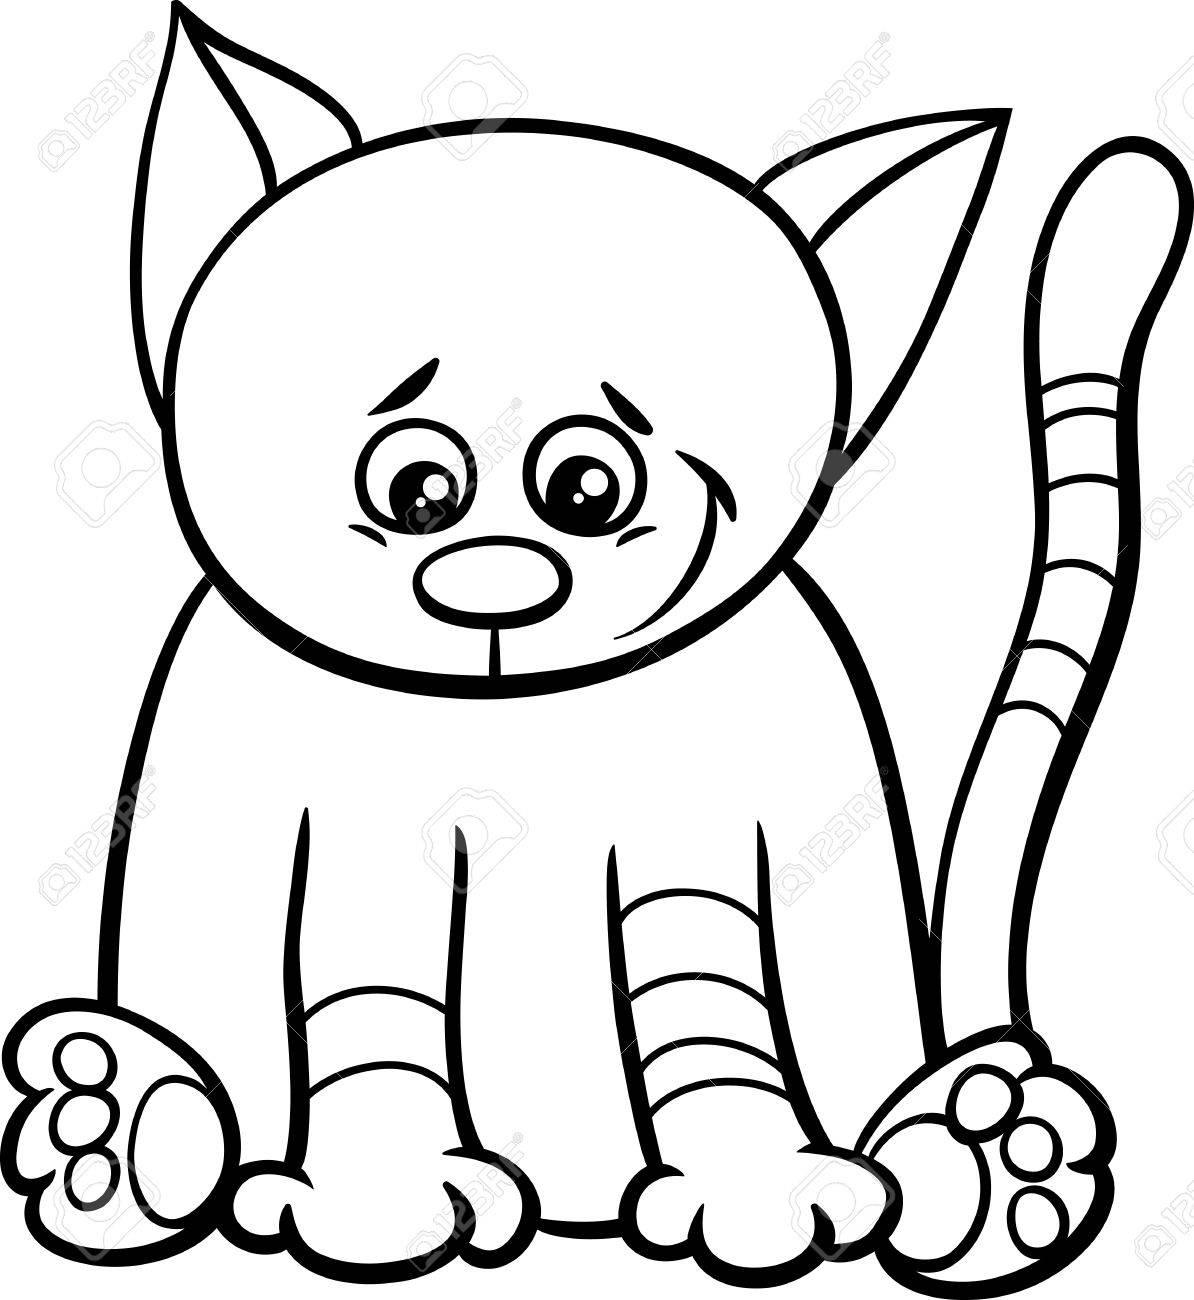 Black And White Cartoon Illustration Of Cat Or Kitten Animal ...